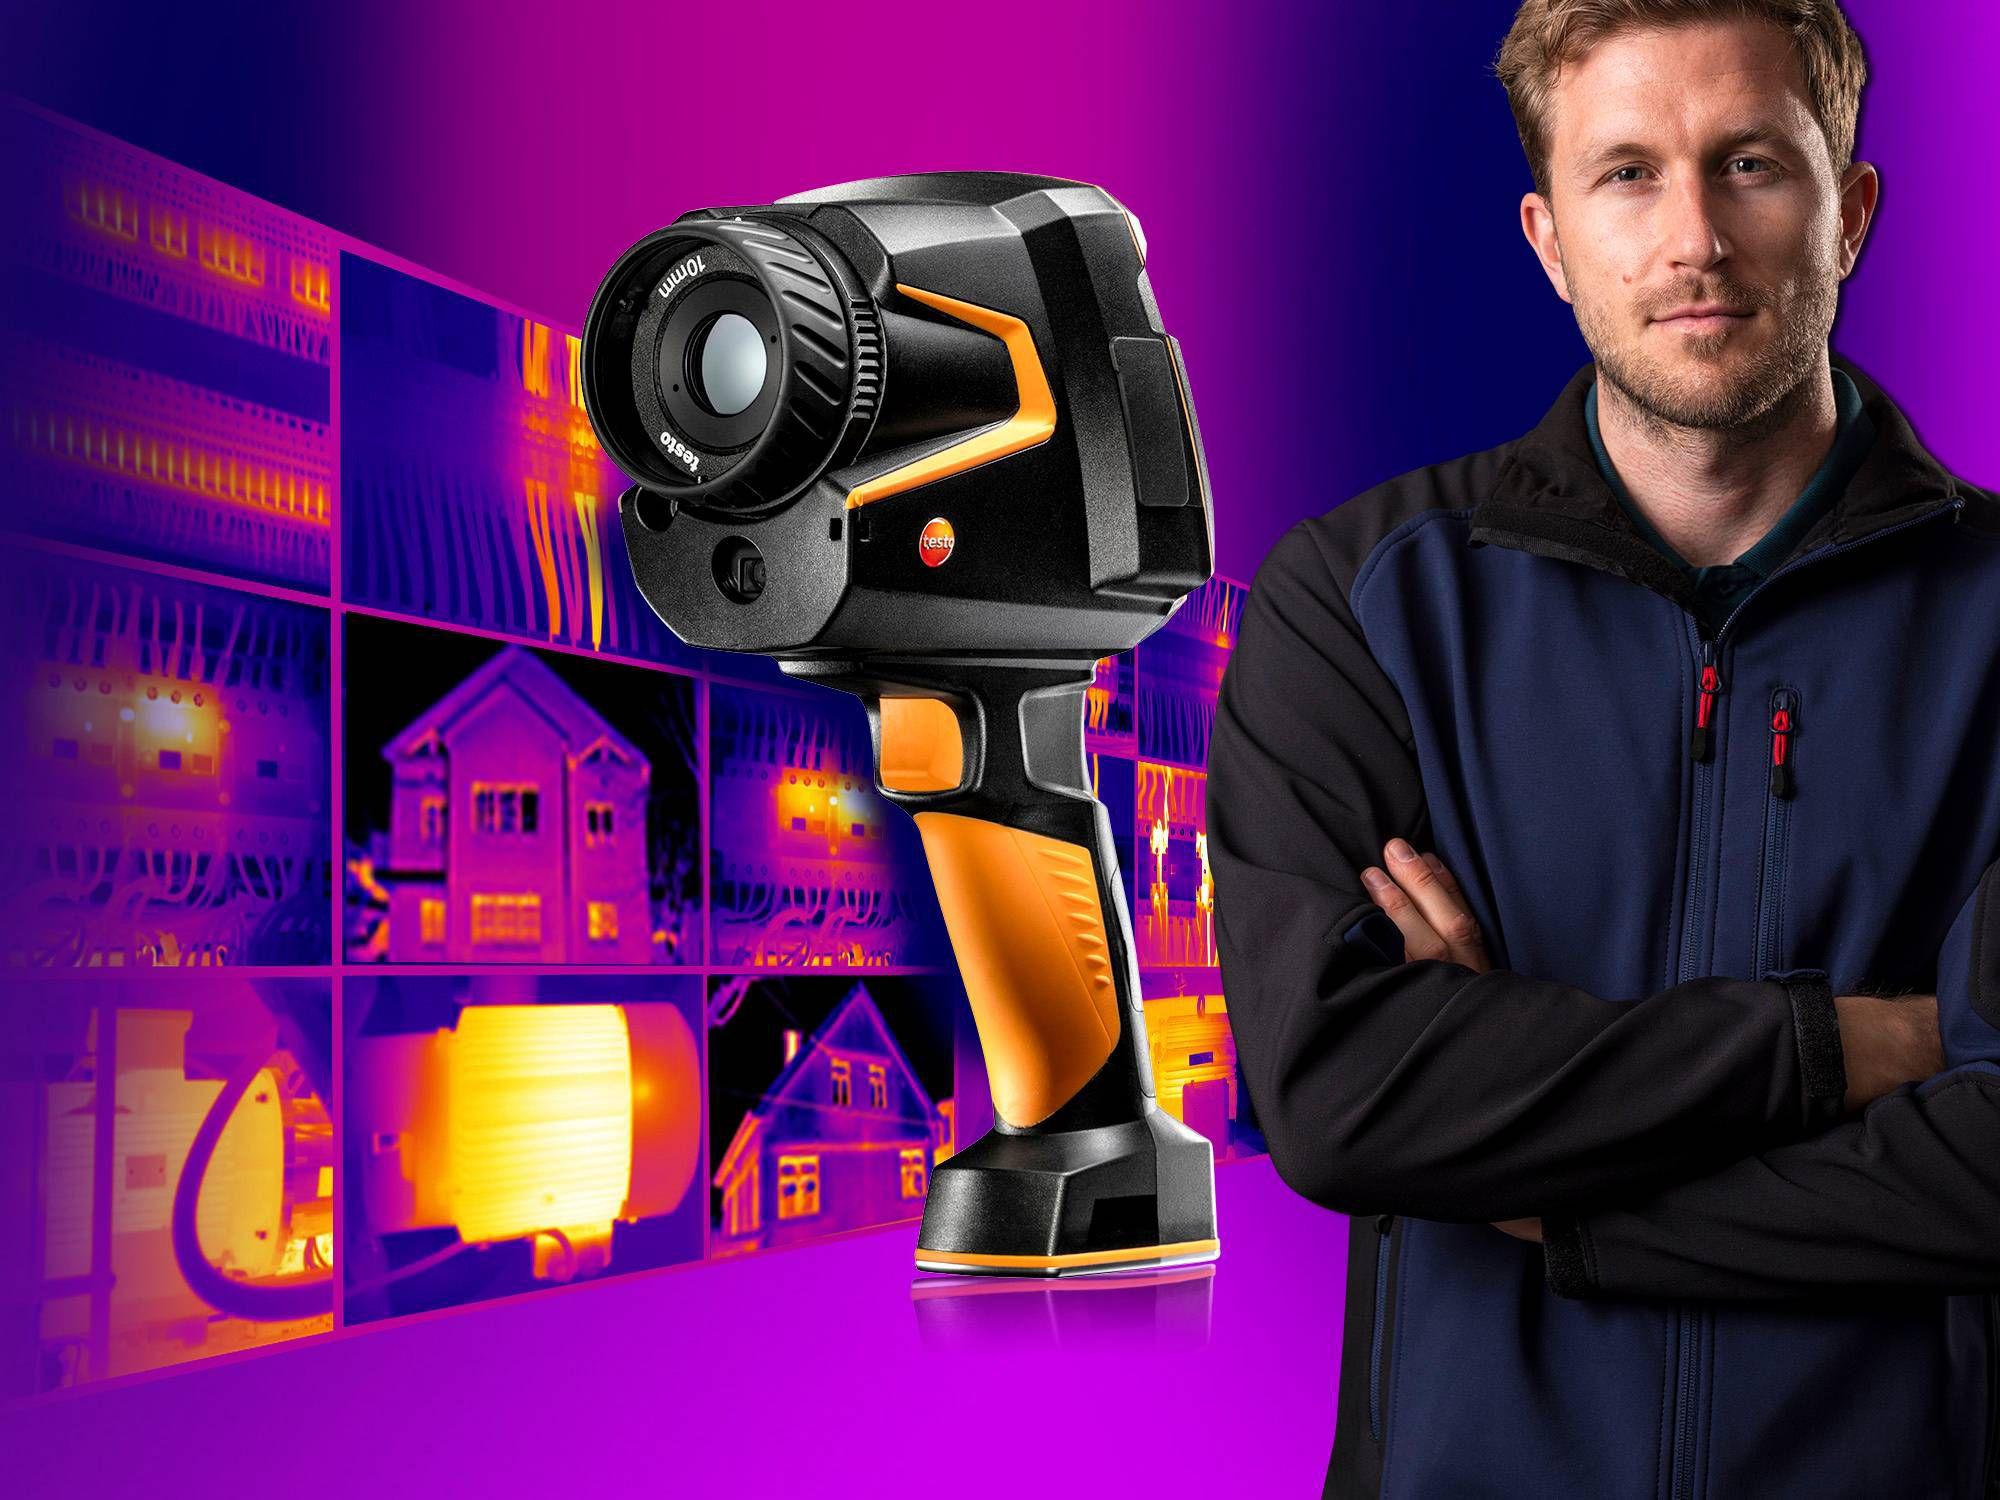 Neue Wärmebildkamera testo 883